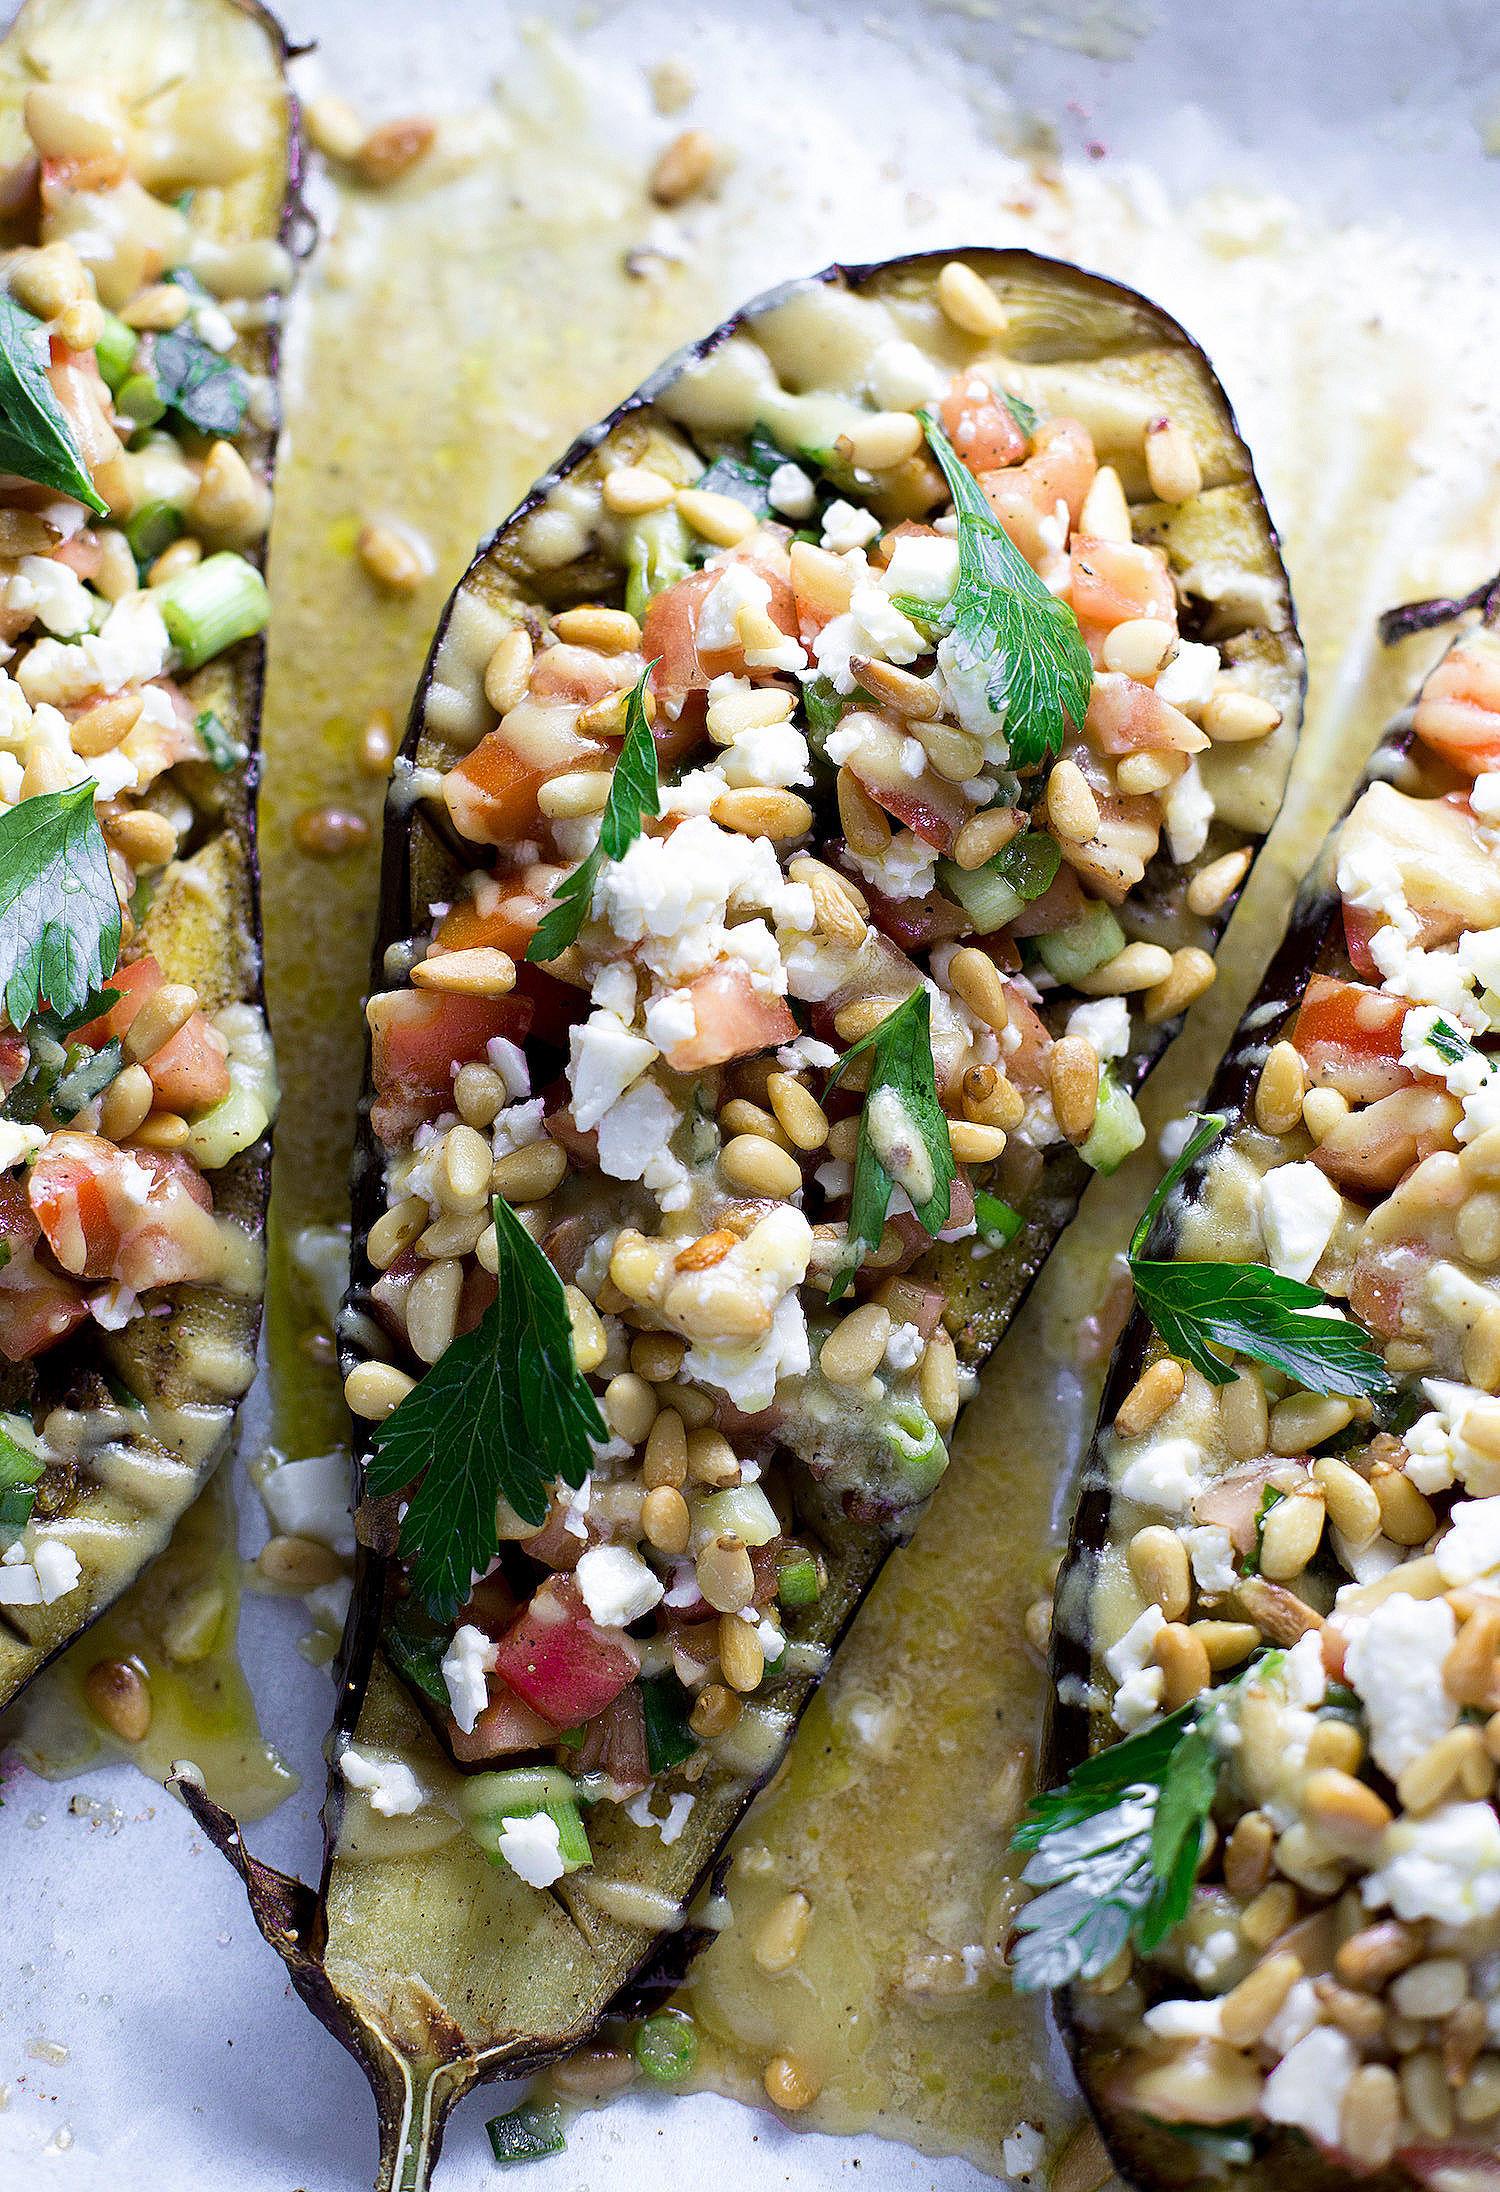 Roasted Eggplant with Tomatoes, Scallions, and Tahini: tender roasted eggplant halves with veggies, pine nuts, feta, and an addictive tahini dressing. | TrufflesandTrends.com